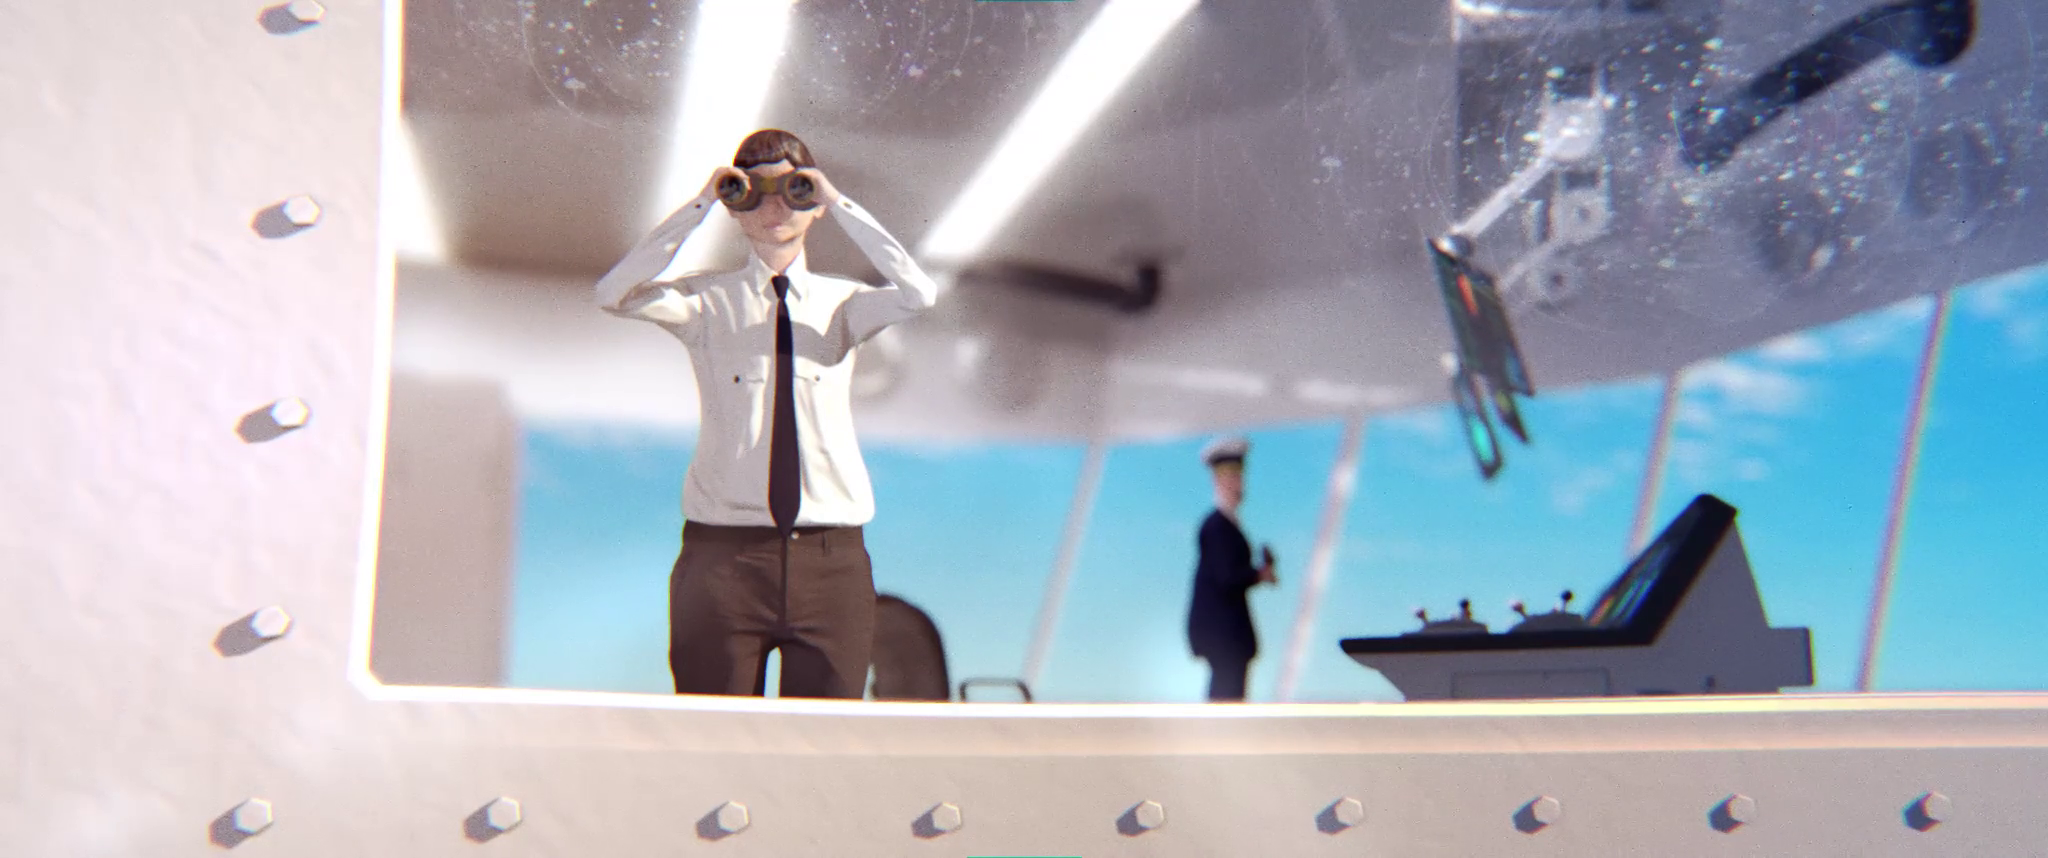 The Cruiser (2020)